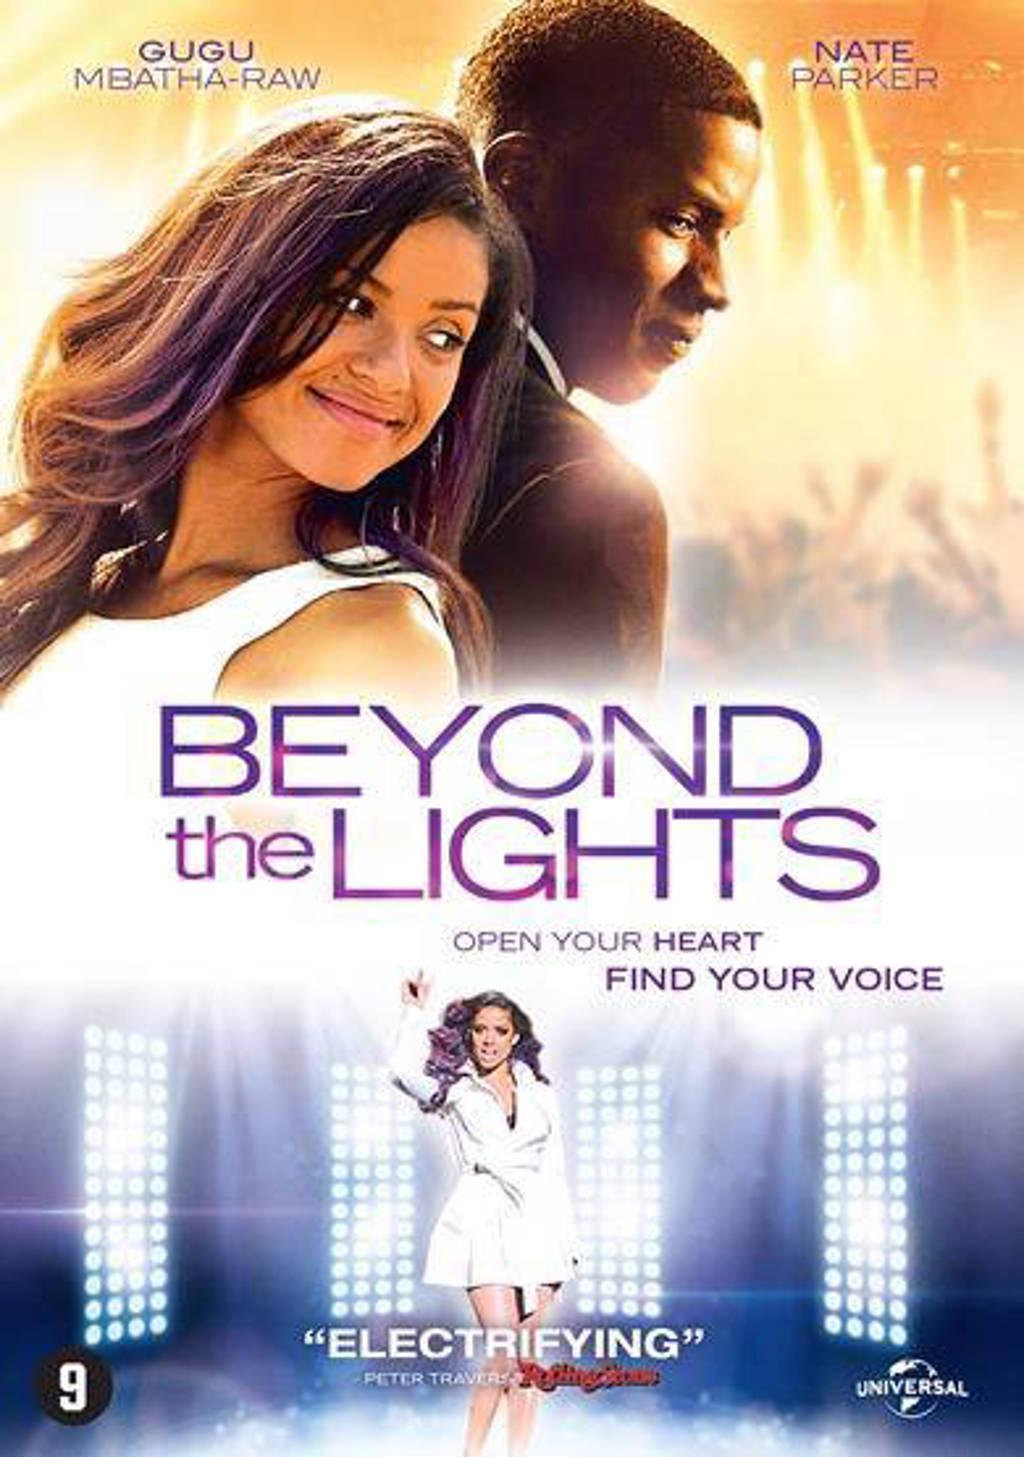 Beyond the lights (DVD)